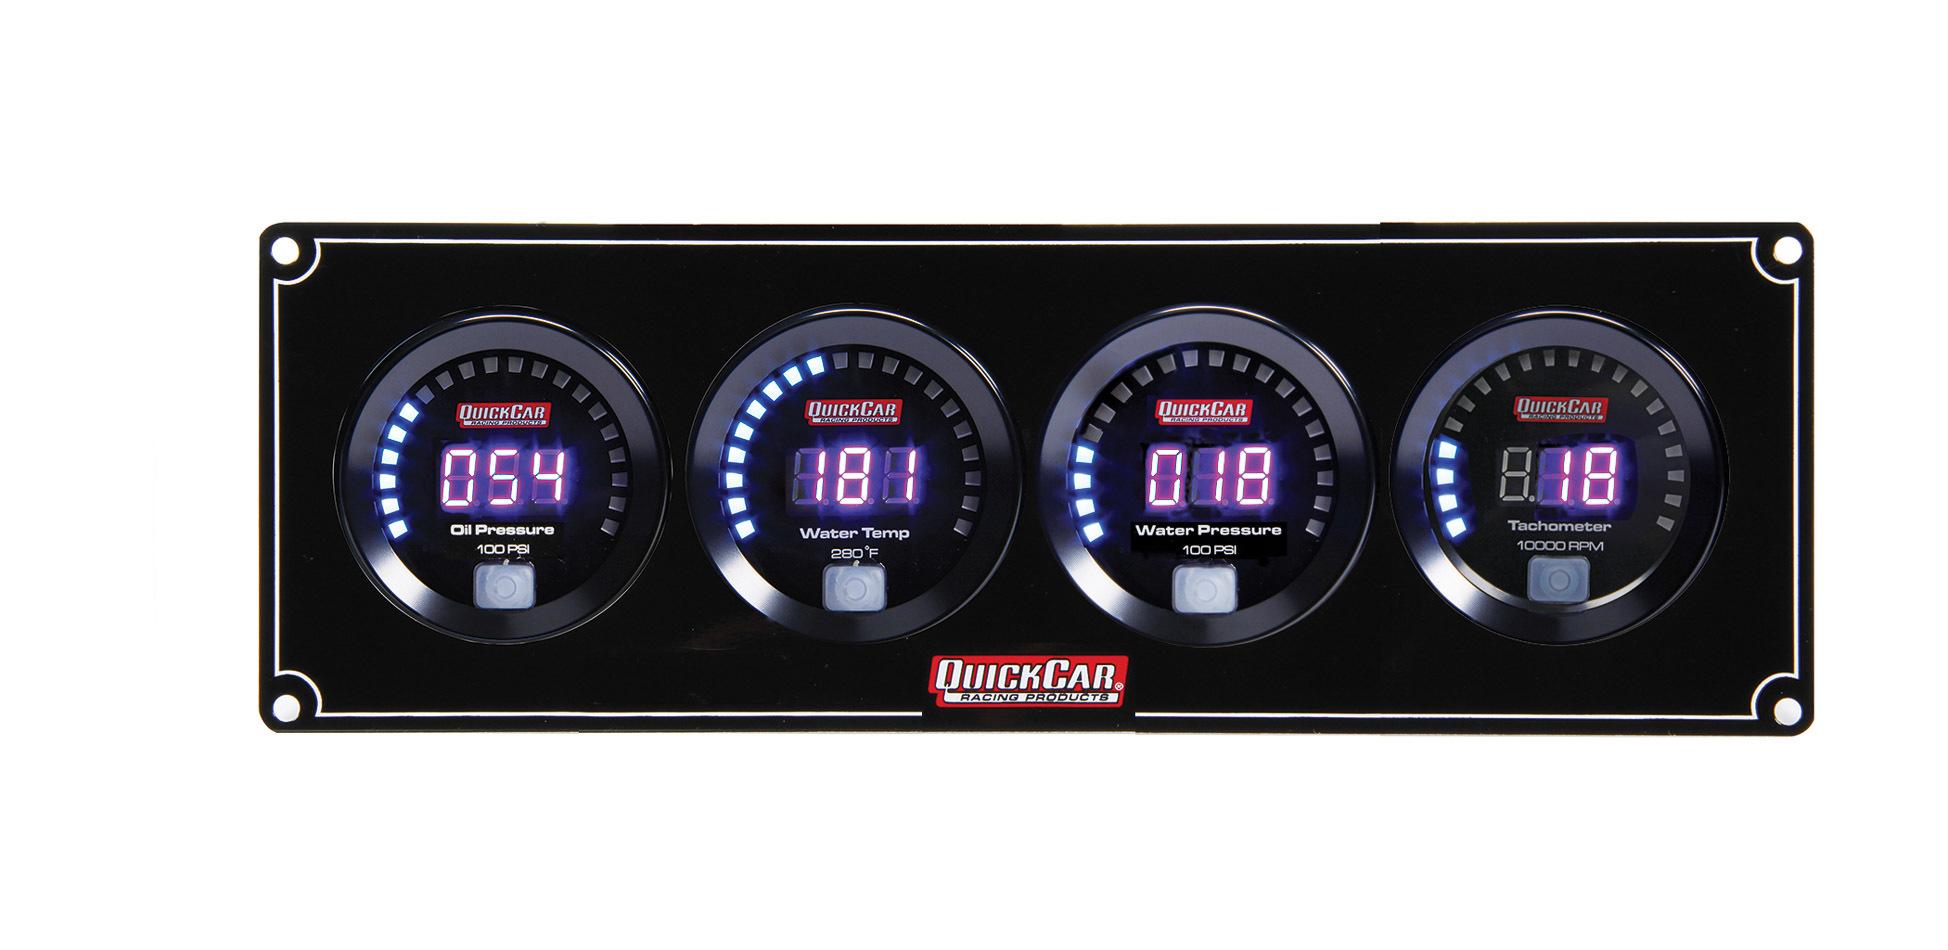 QuickCar 67-3046 Gauge Panel Assembly, Digital, Oil Pressure / Water Temperature / Water Pressure / Tachometer, Black Face, Kit